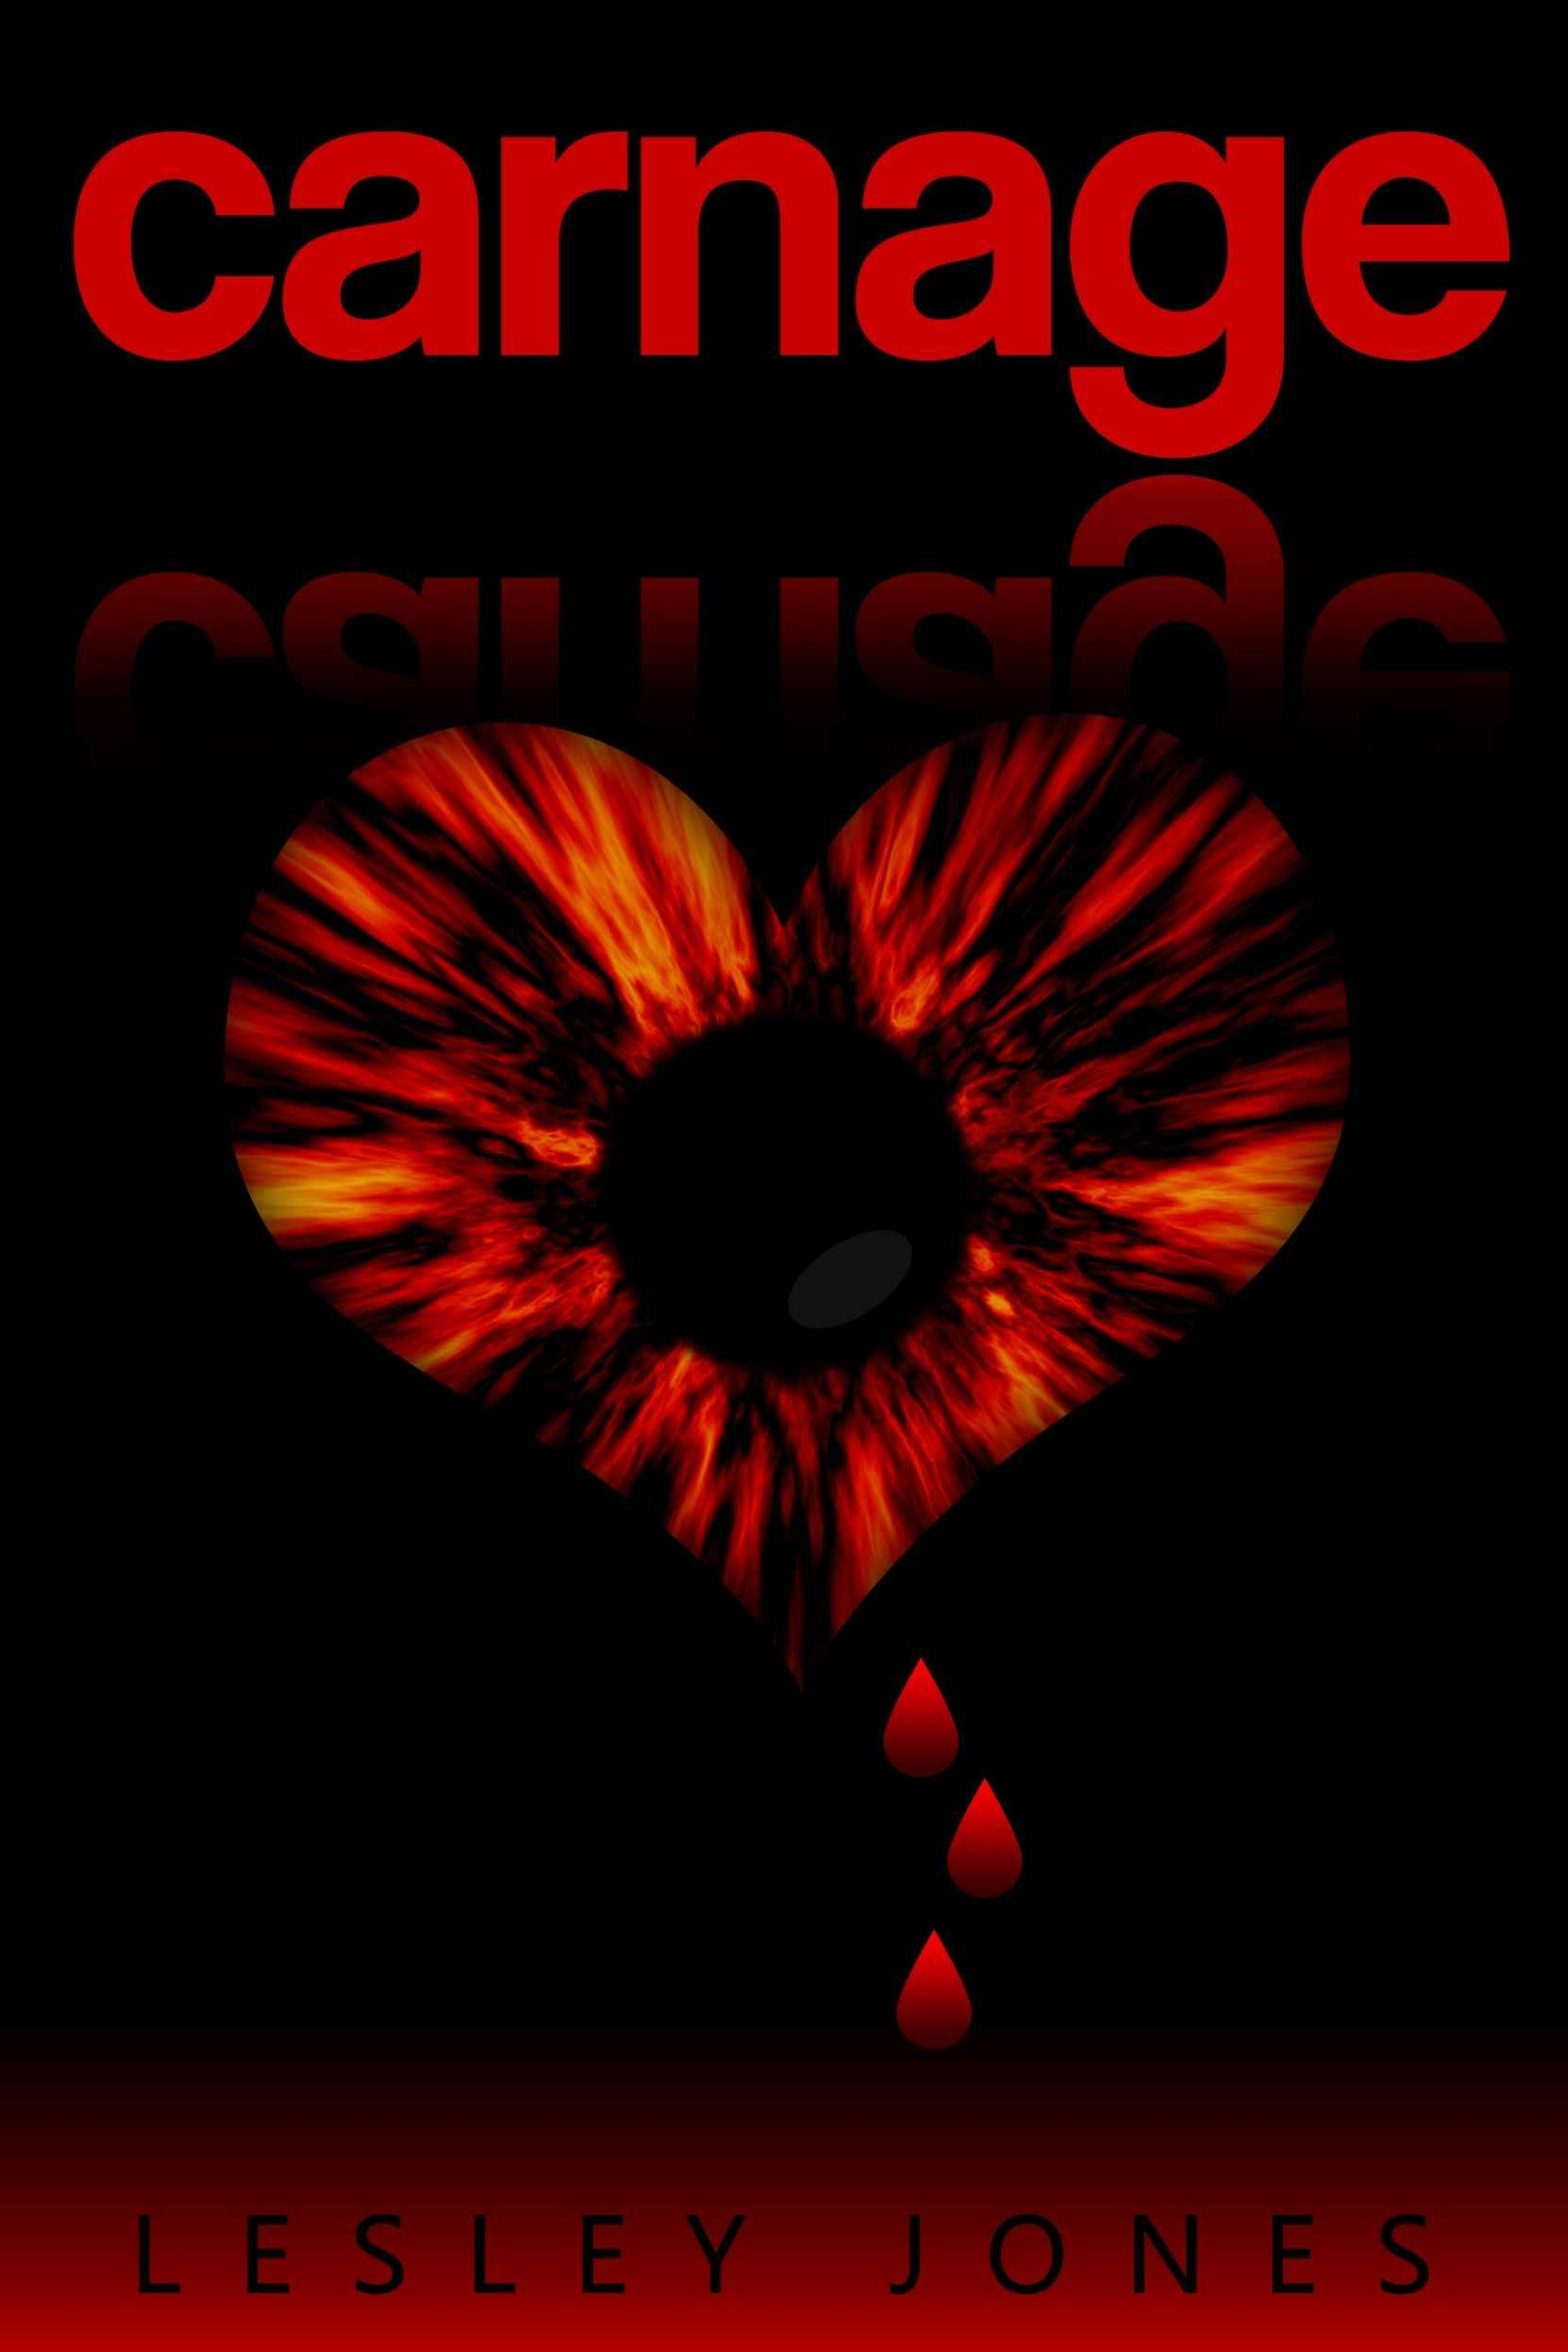 Carnage: Book #1 The Story Of Us Ebook: Lesley Jones: Amazon